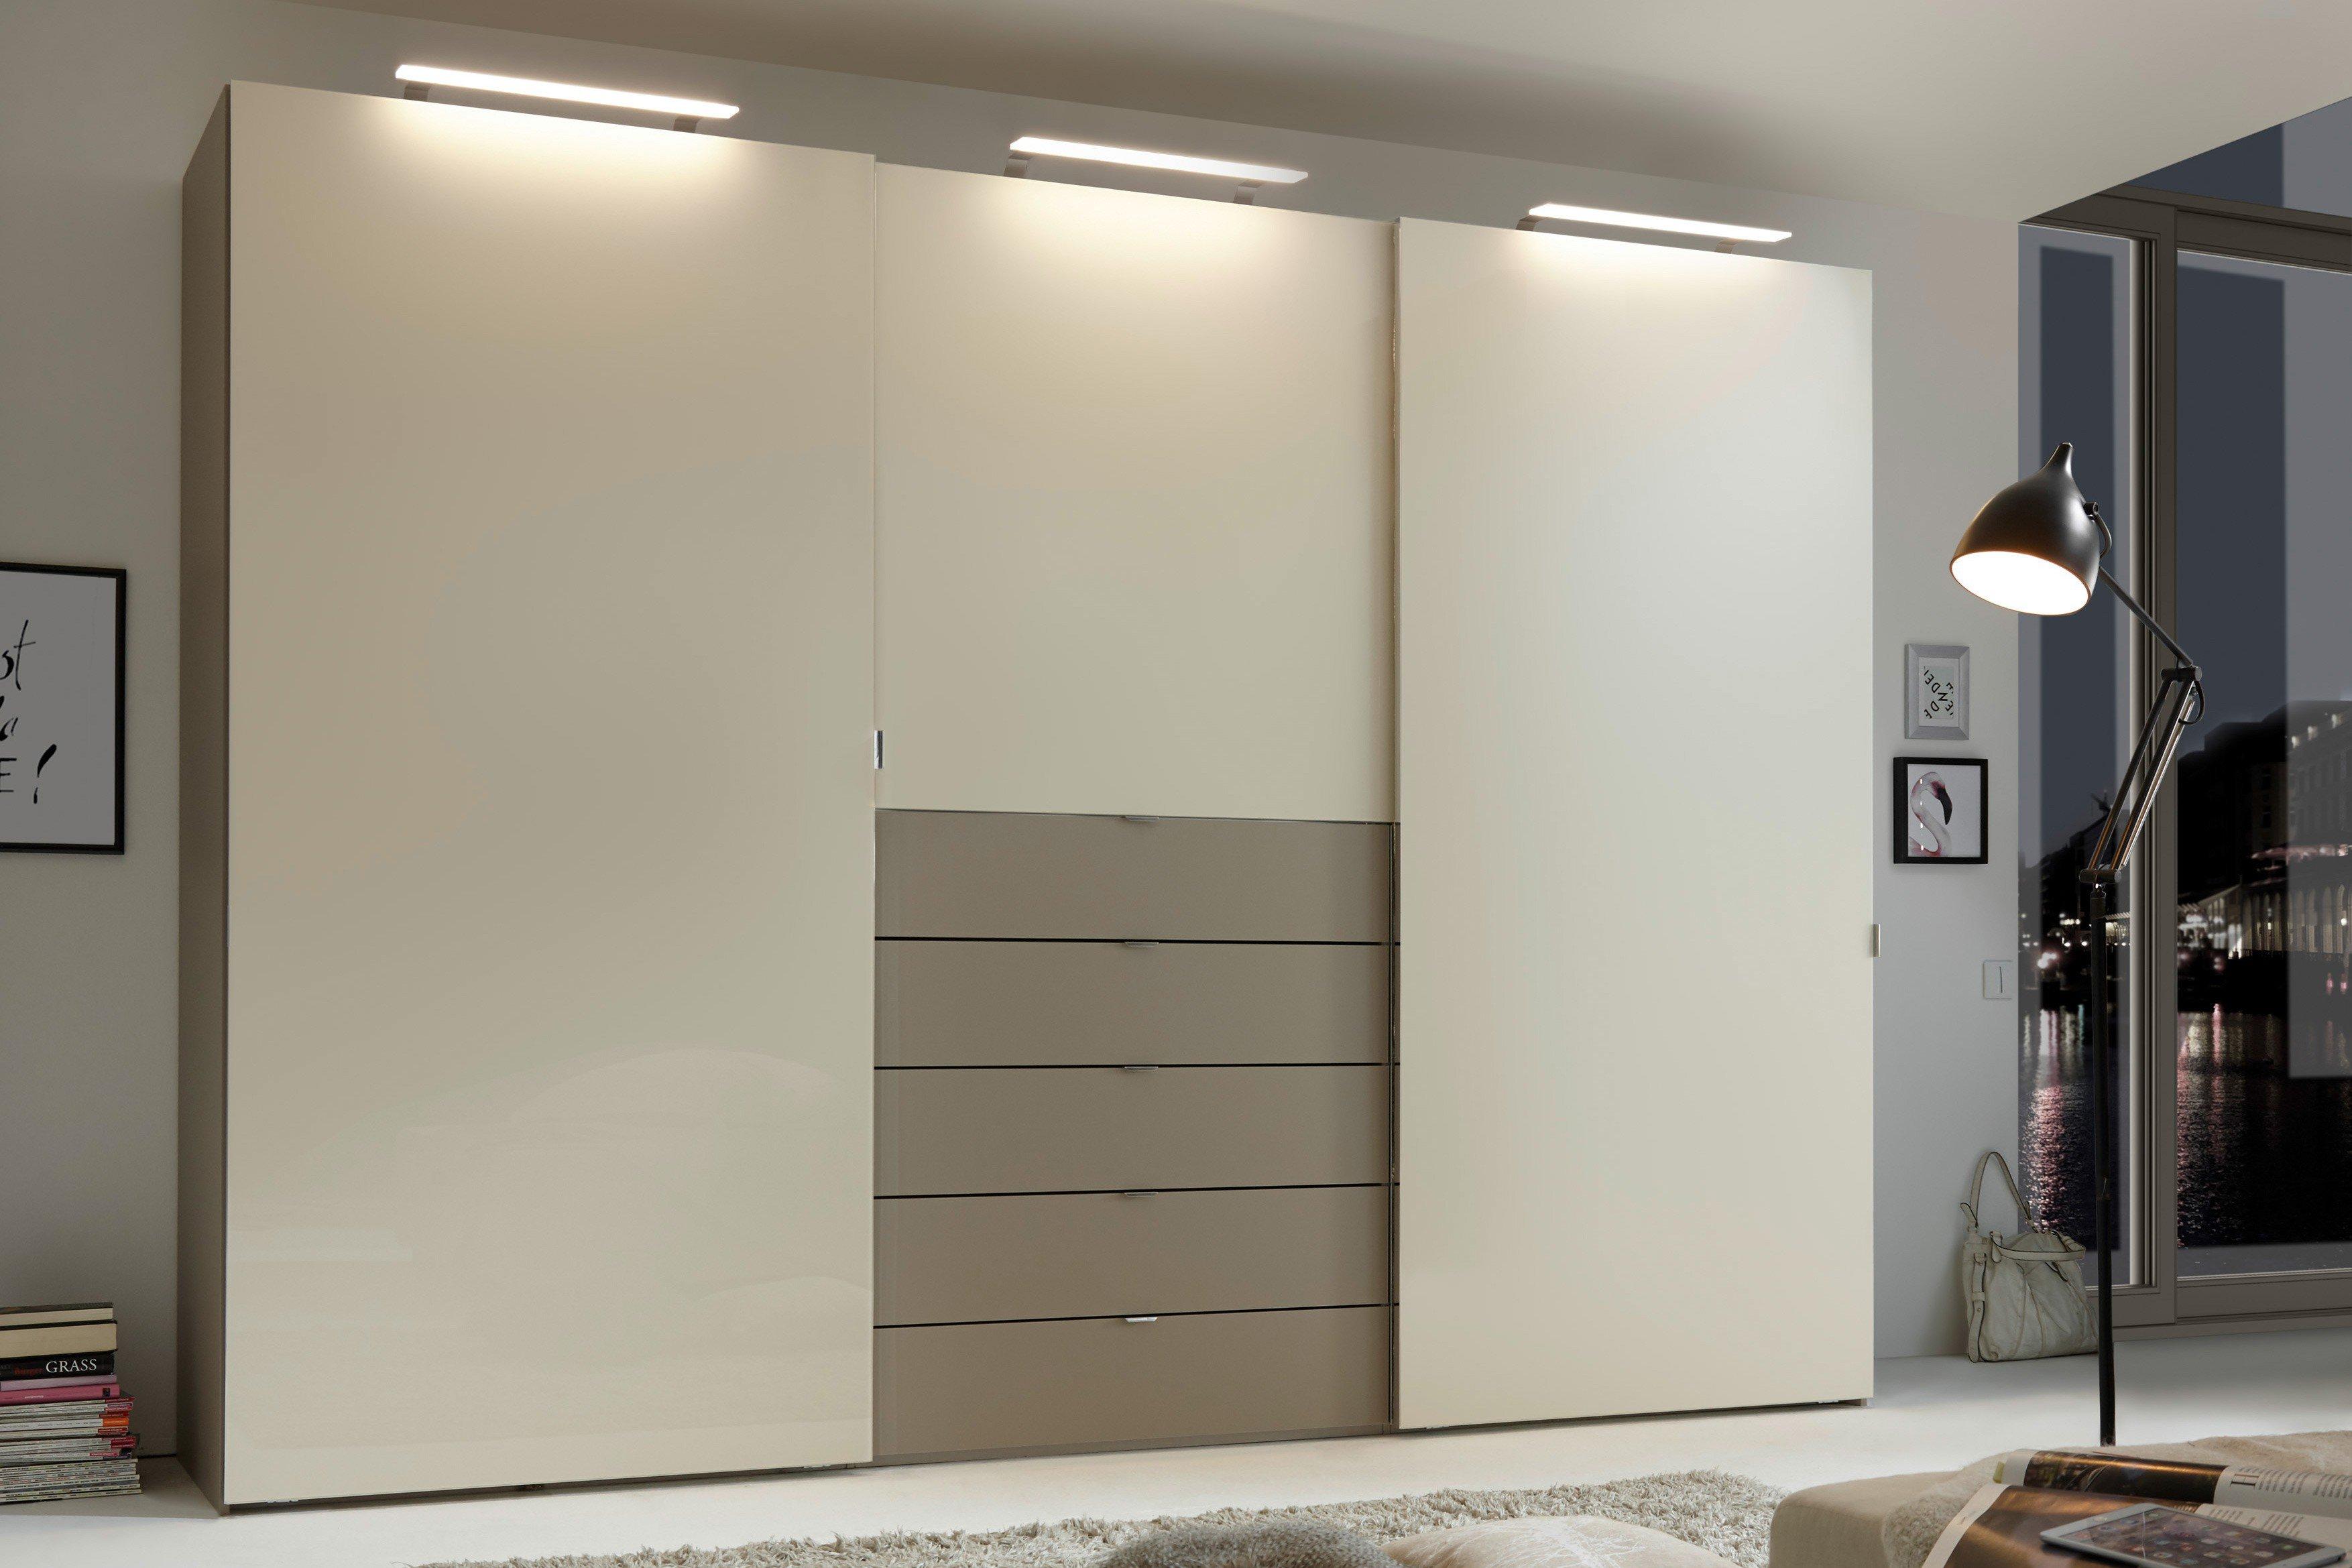 staud media multi schrank umbra magnoliaglas m bel letz ihr online shop. Black Bedroom Furniture Sets. Home Design Ideas